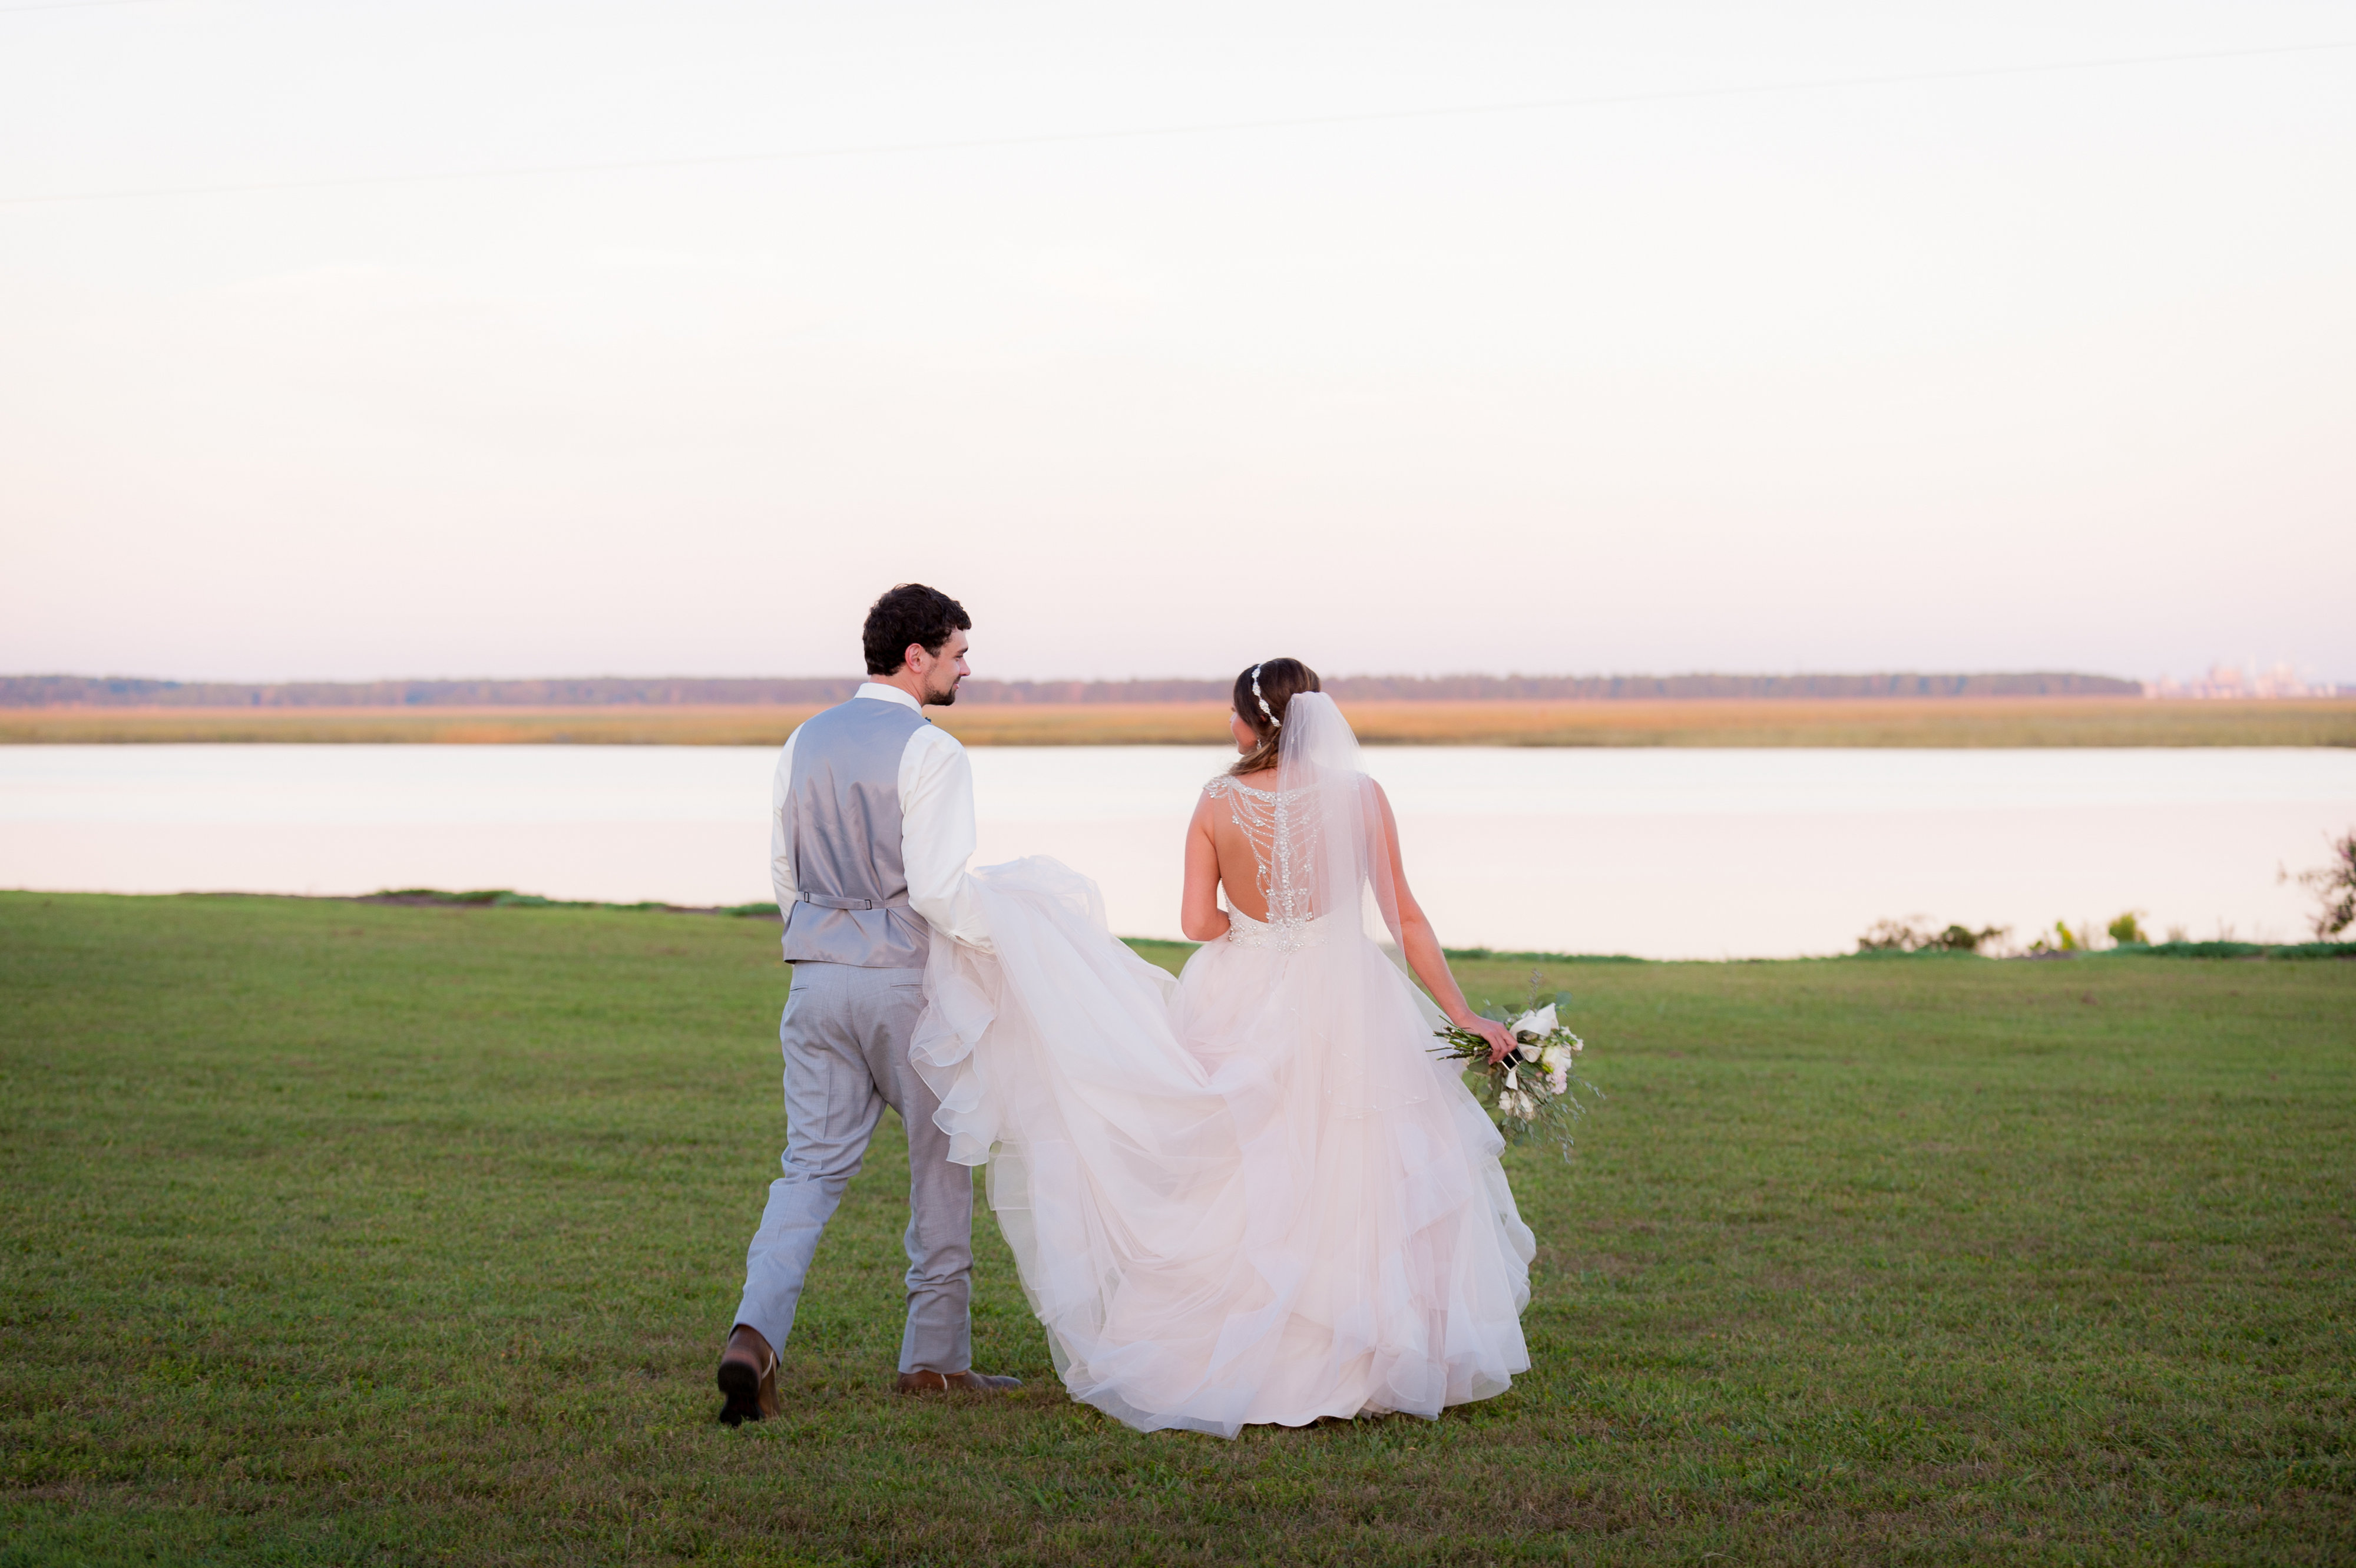 Amber L Richards Photography 7 Ashley Aaron Ruggerio s Wedding-Ashley Aaron s Portraits-0042